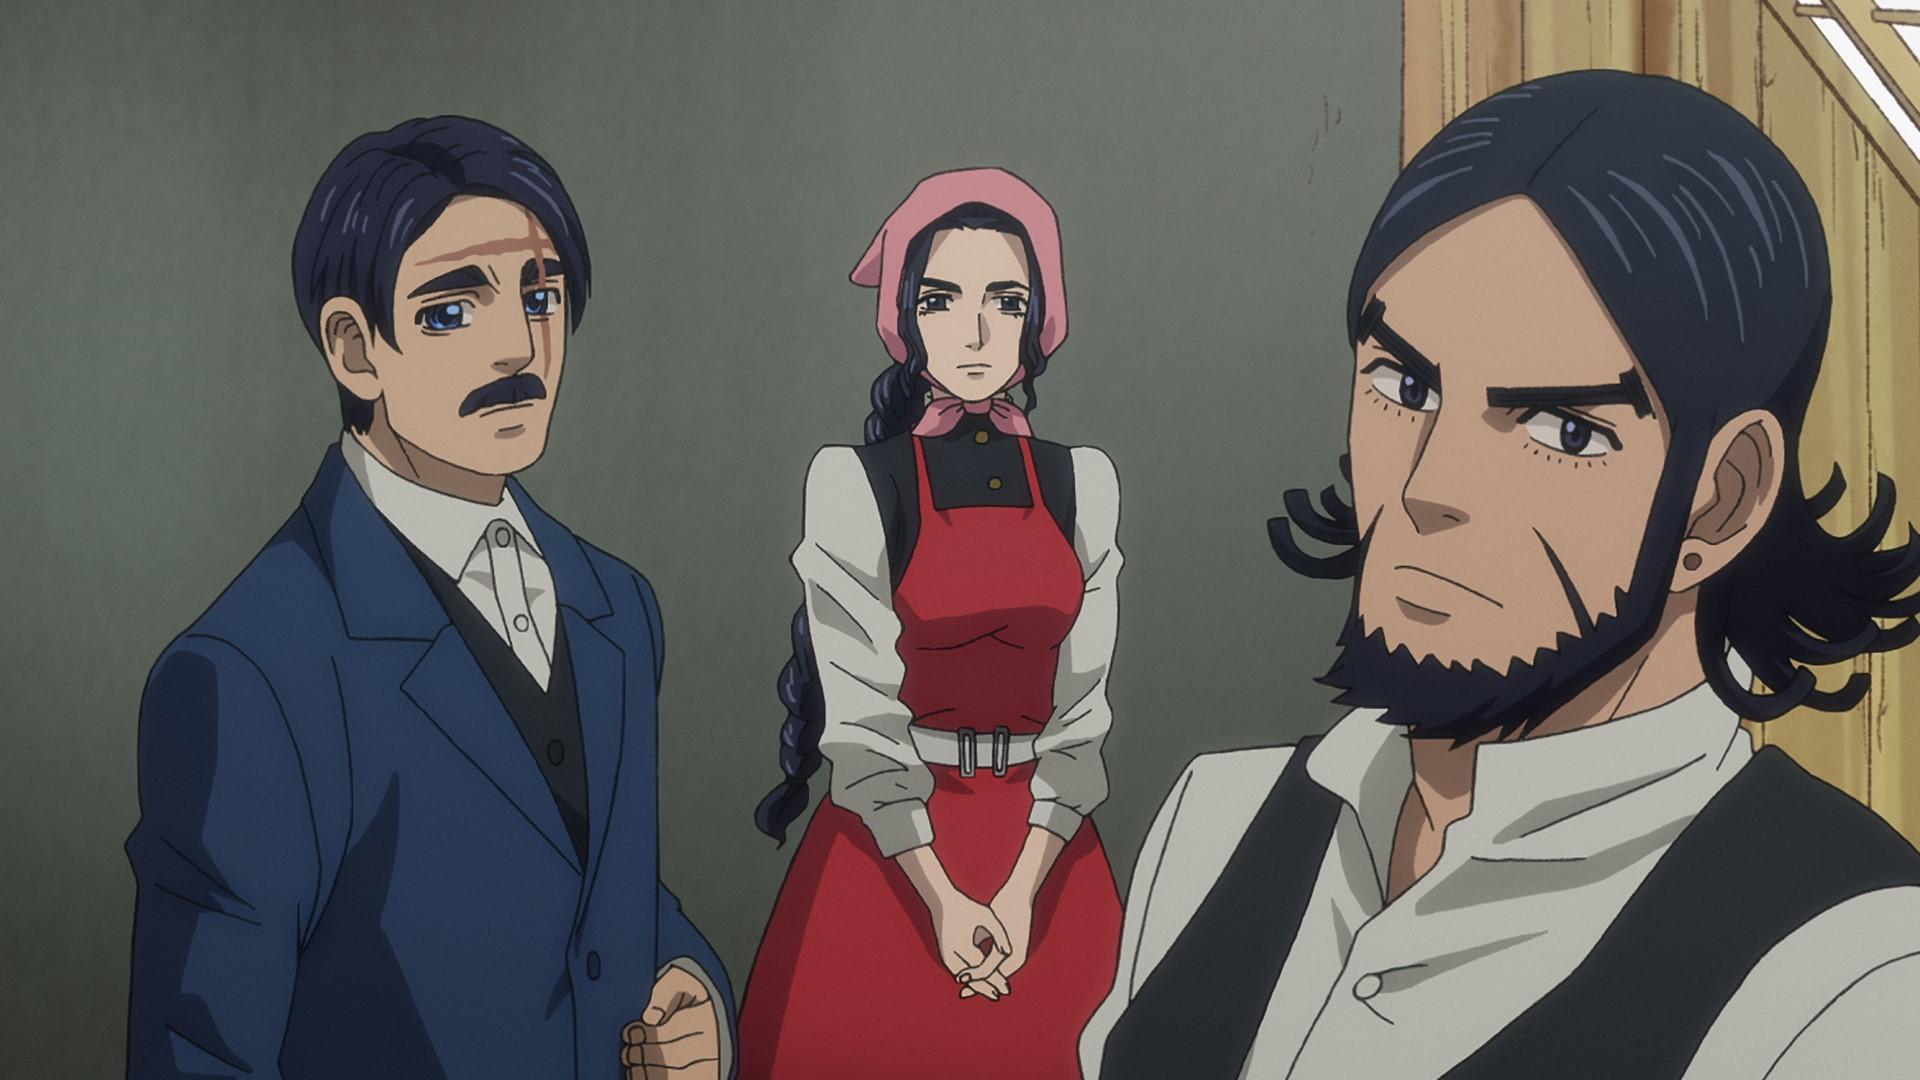 TVアニメ「ゴールデンカムイ」第三十三話「革命家」あらすじ&先行カット到着!キロランケが日本へ渡る前の出来事を語る